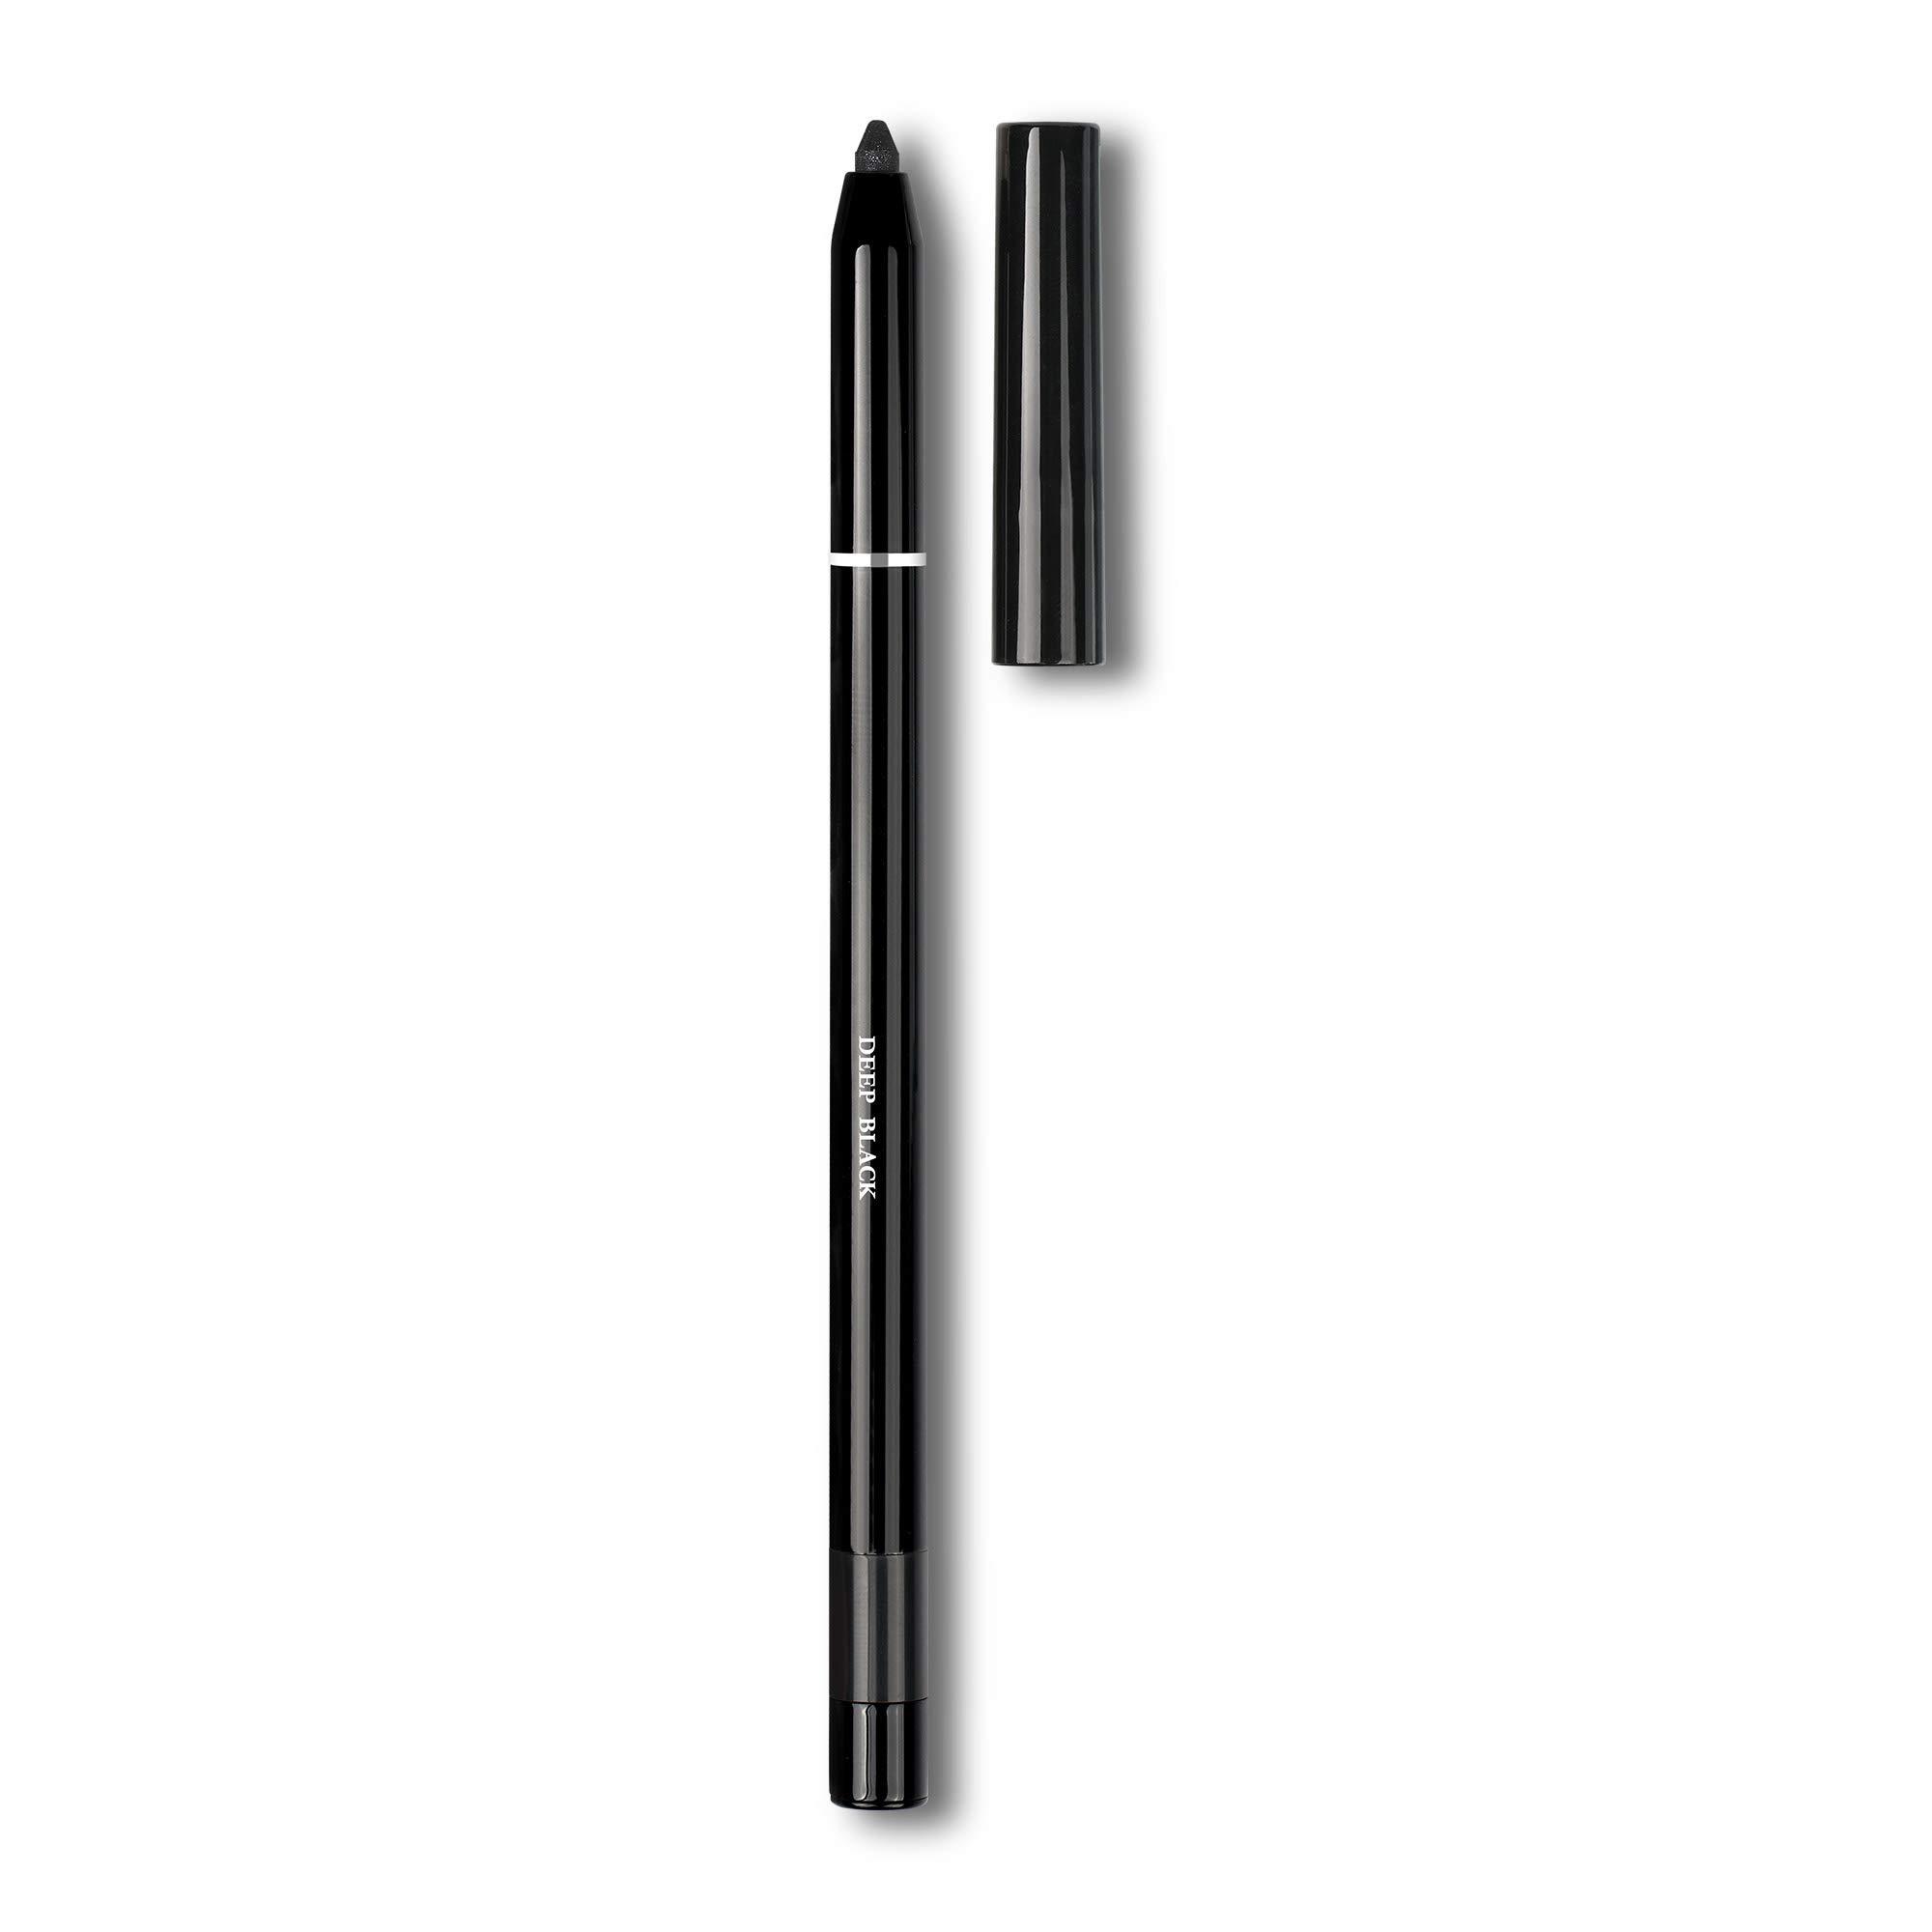 WaterProof Premium Gel Eyeliner | Deep Black Color | Dlux Professional | MakeUp | 0.4 g | Oil free | Double Shadow Effect | Fineset Soft Gel Texture | Sharpner Included